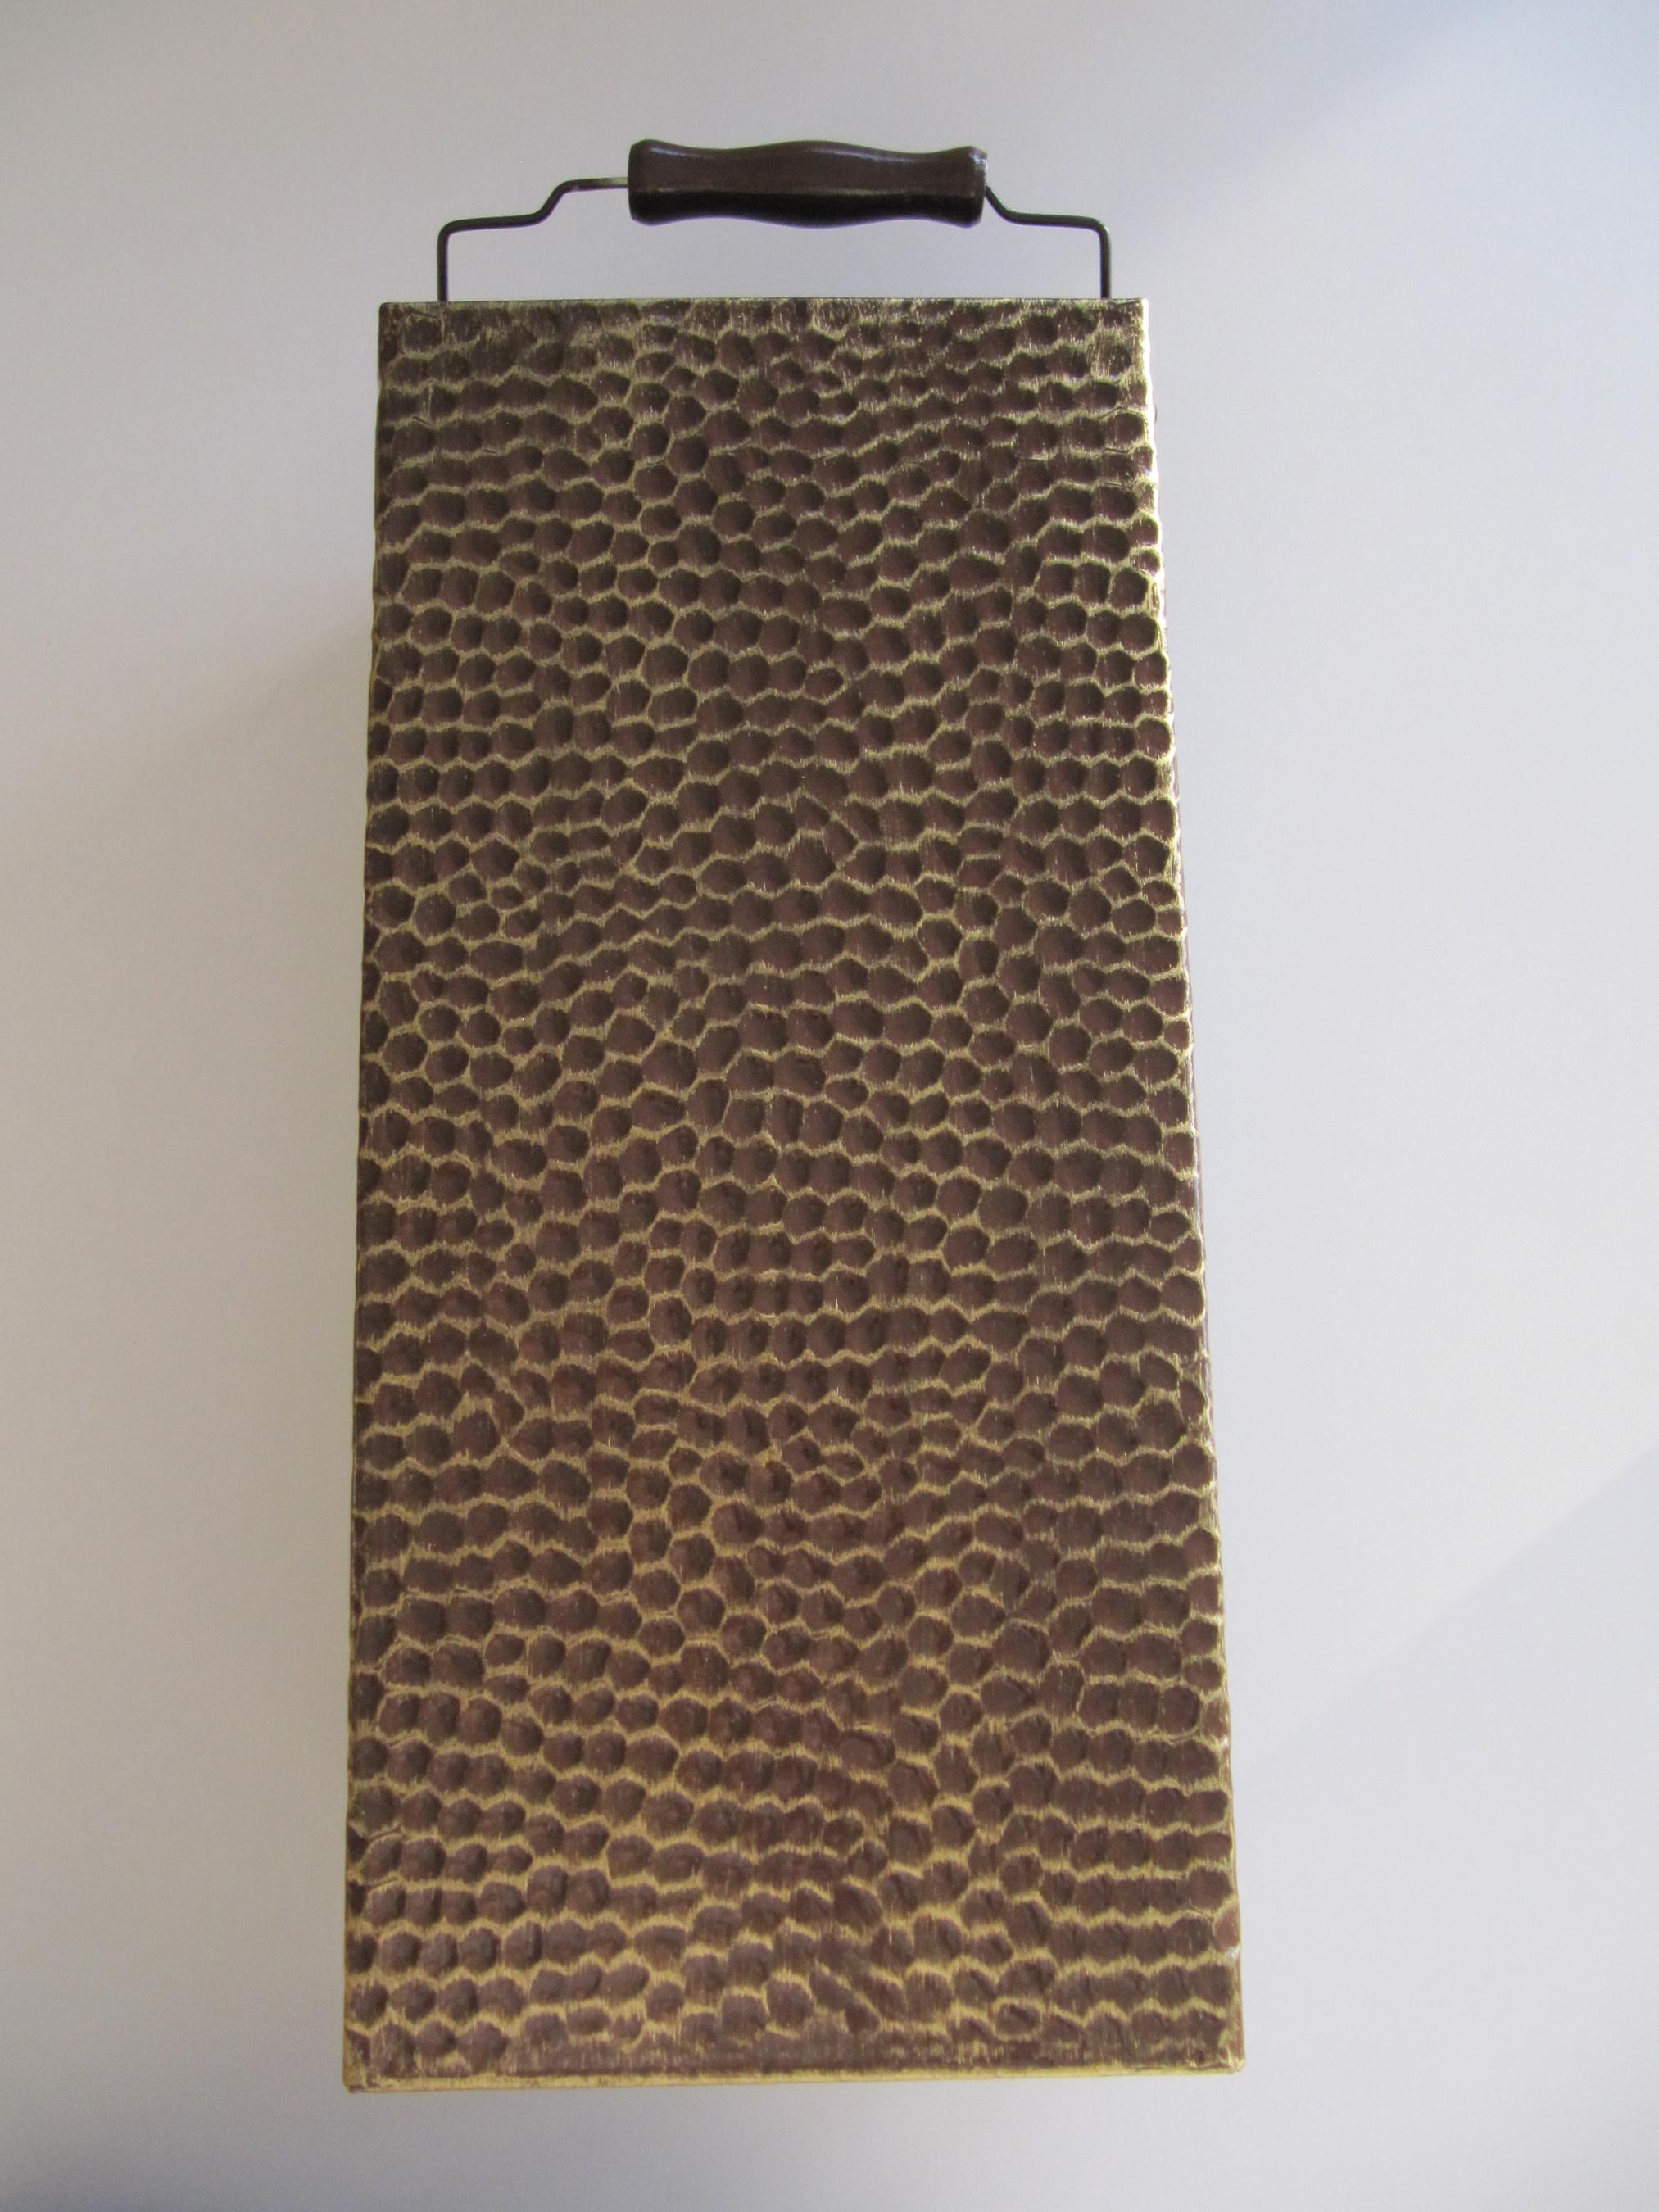 Brikettträger KaminoFlam altmessing Höhe 41,5cm Bild 2